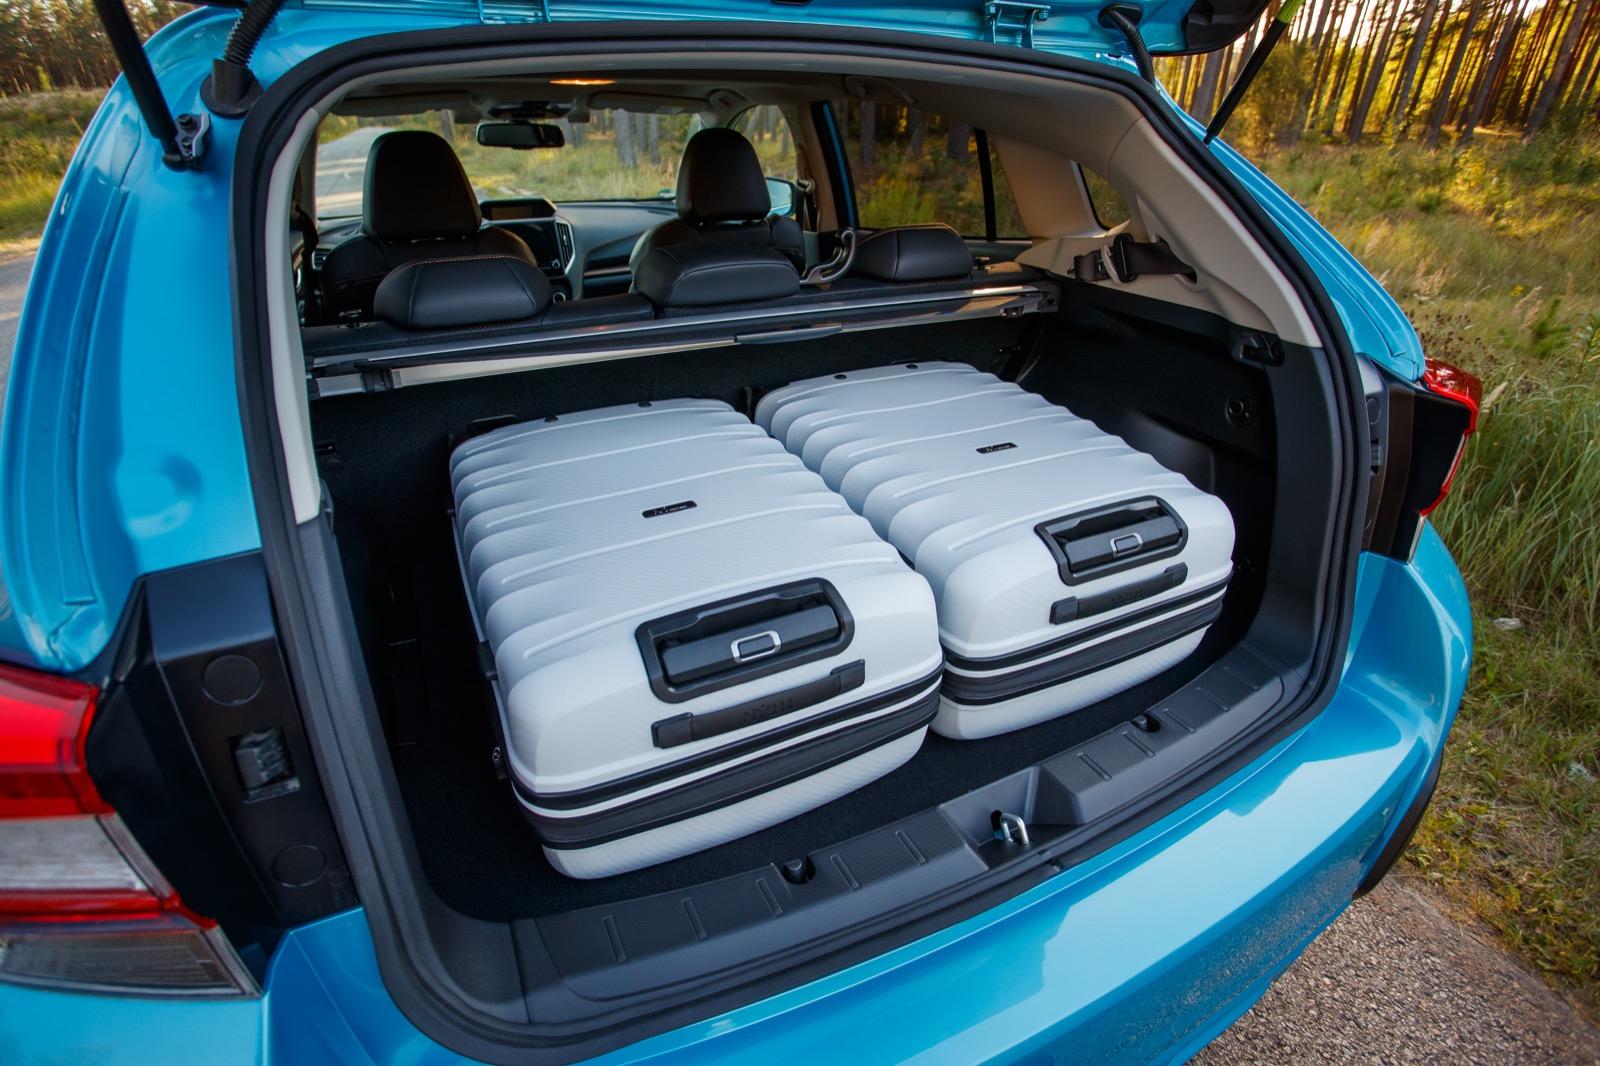 Subaru Xv Eco Hybrid Interior (33)